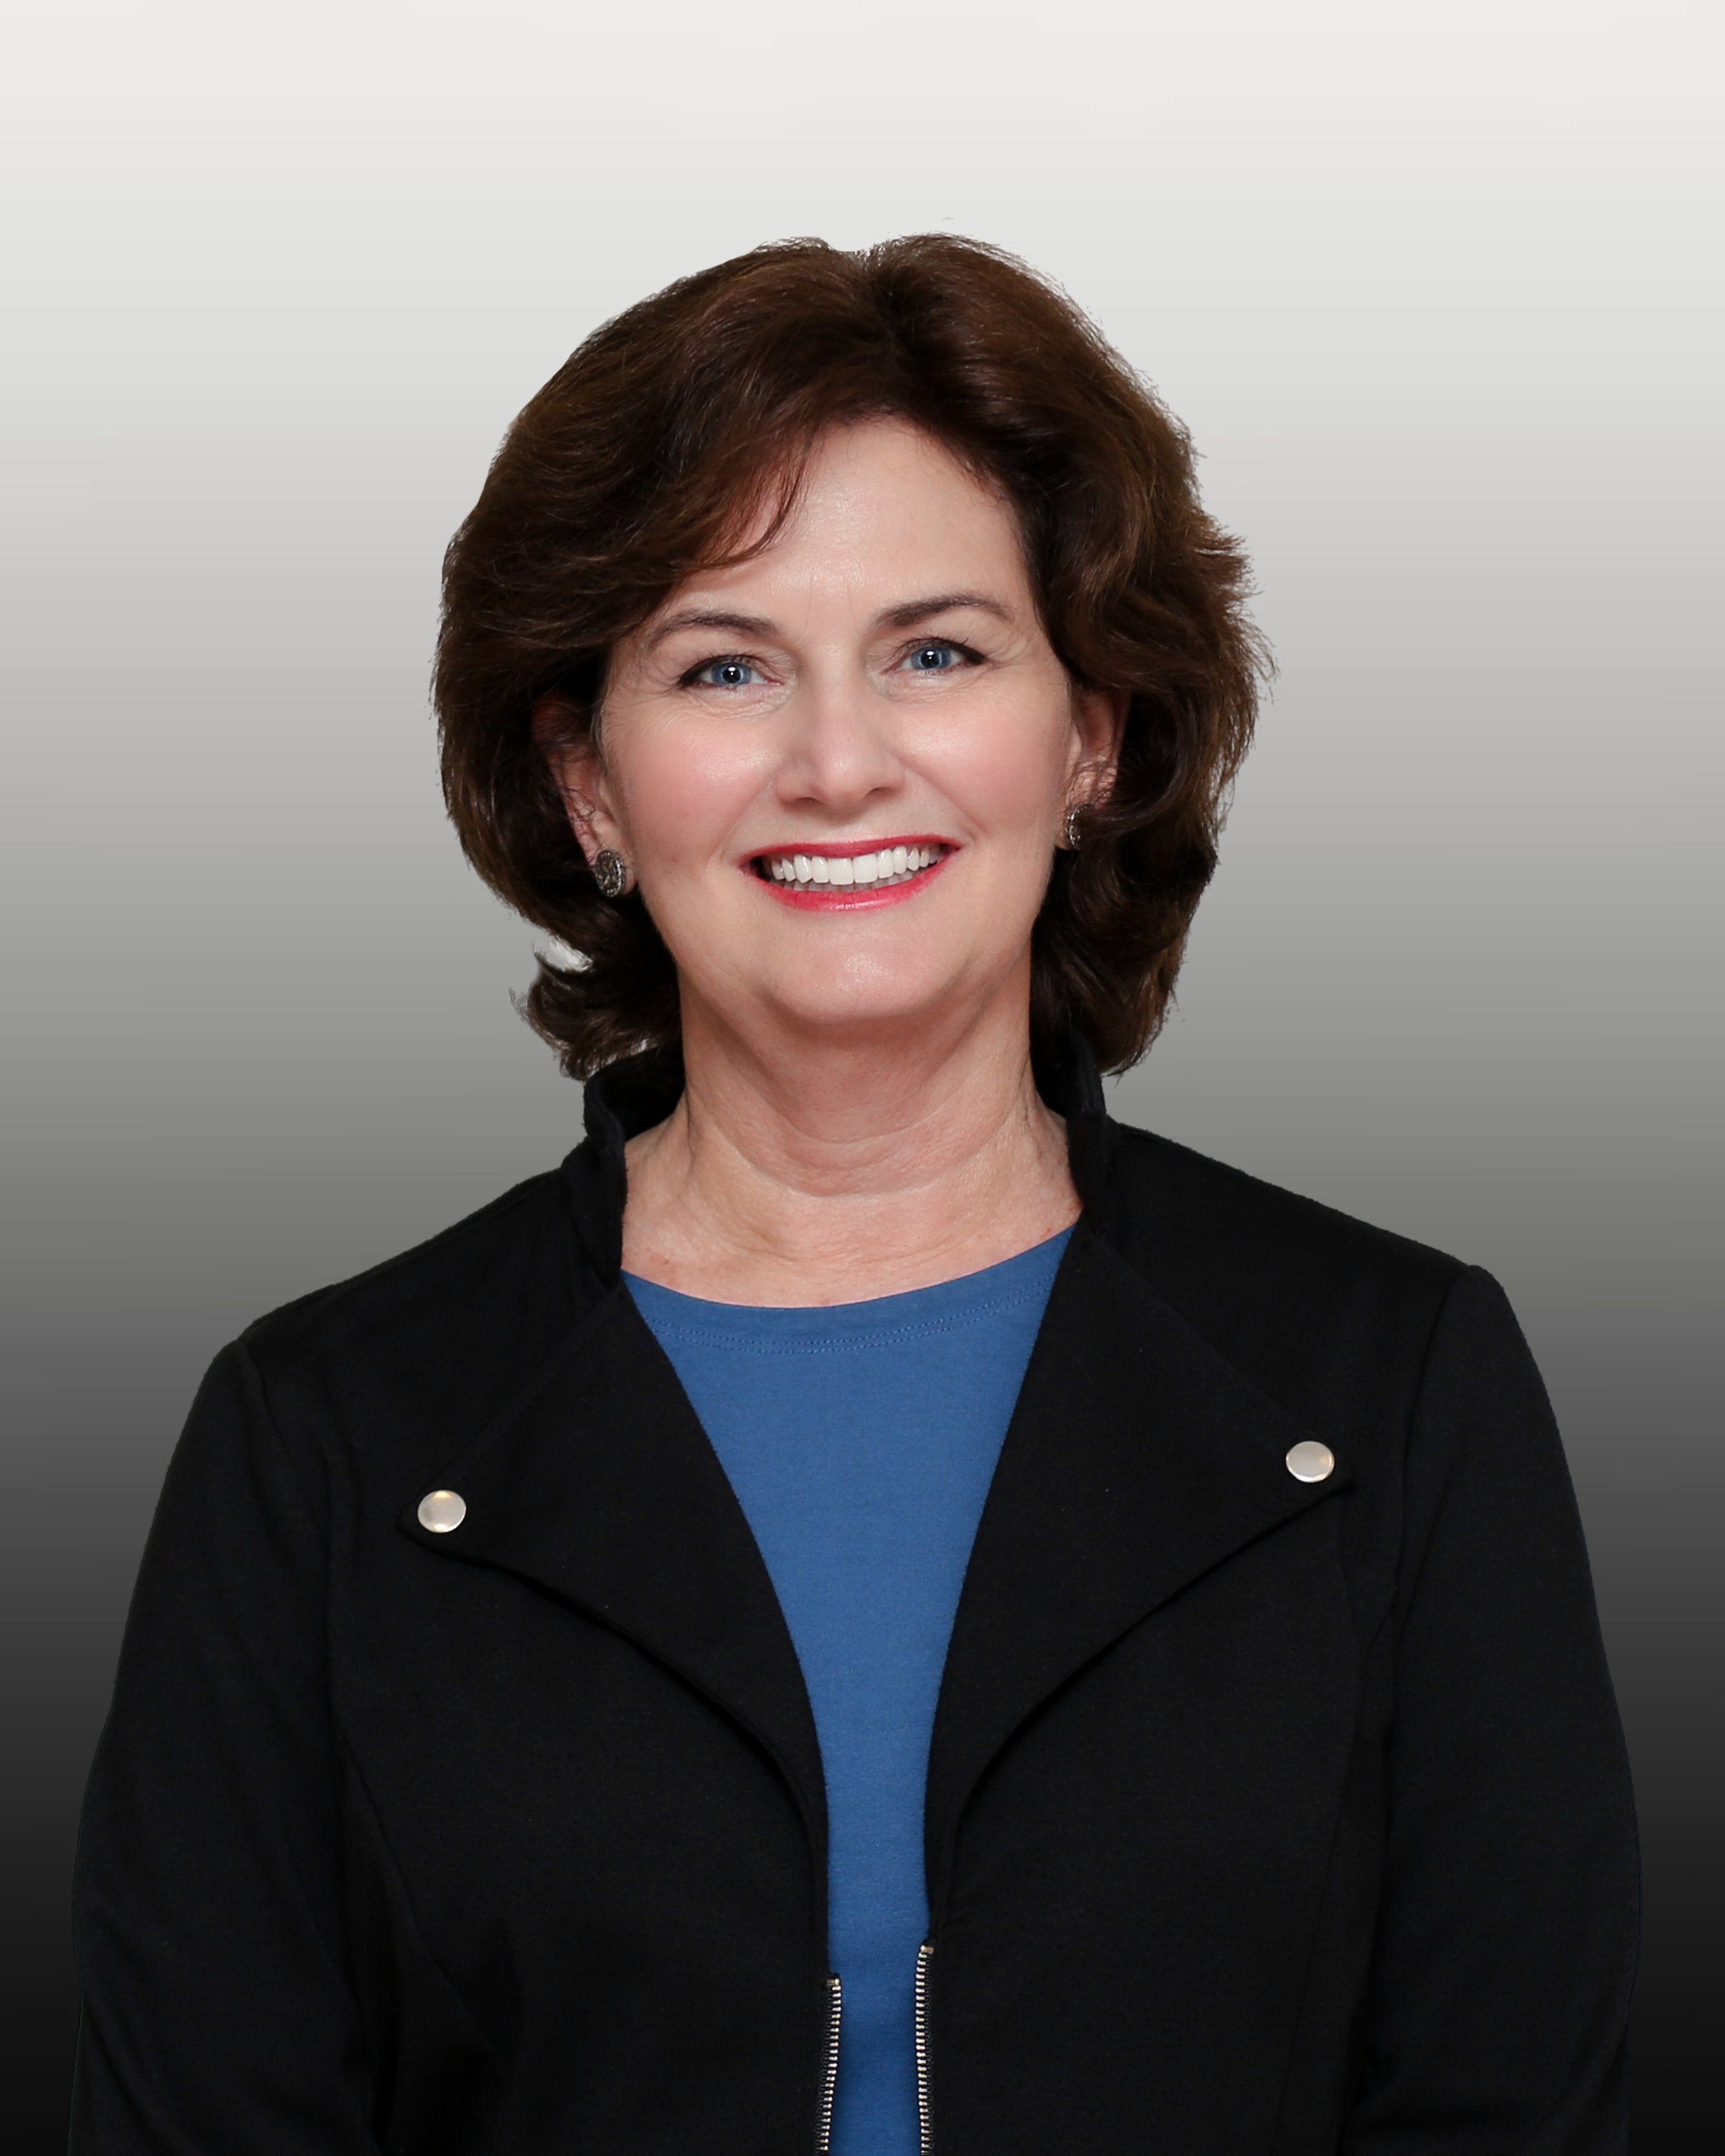 Amanda Landau  Director of Operations & Finance